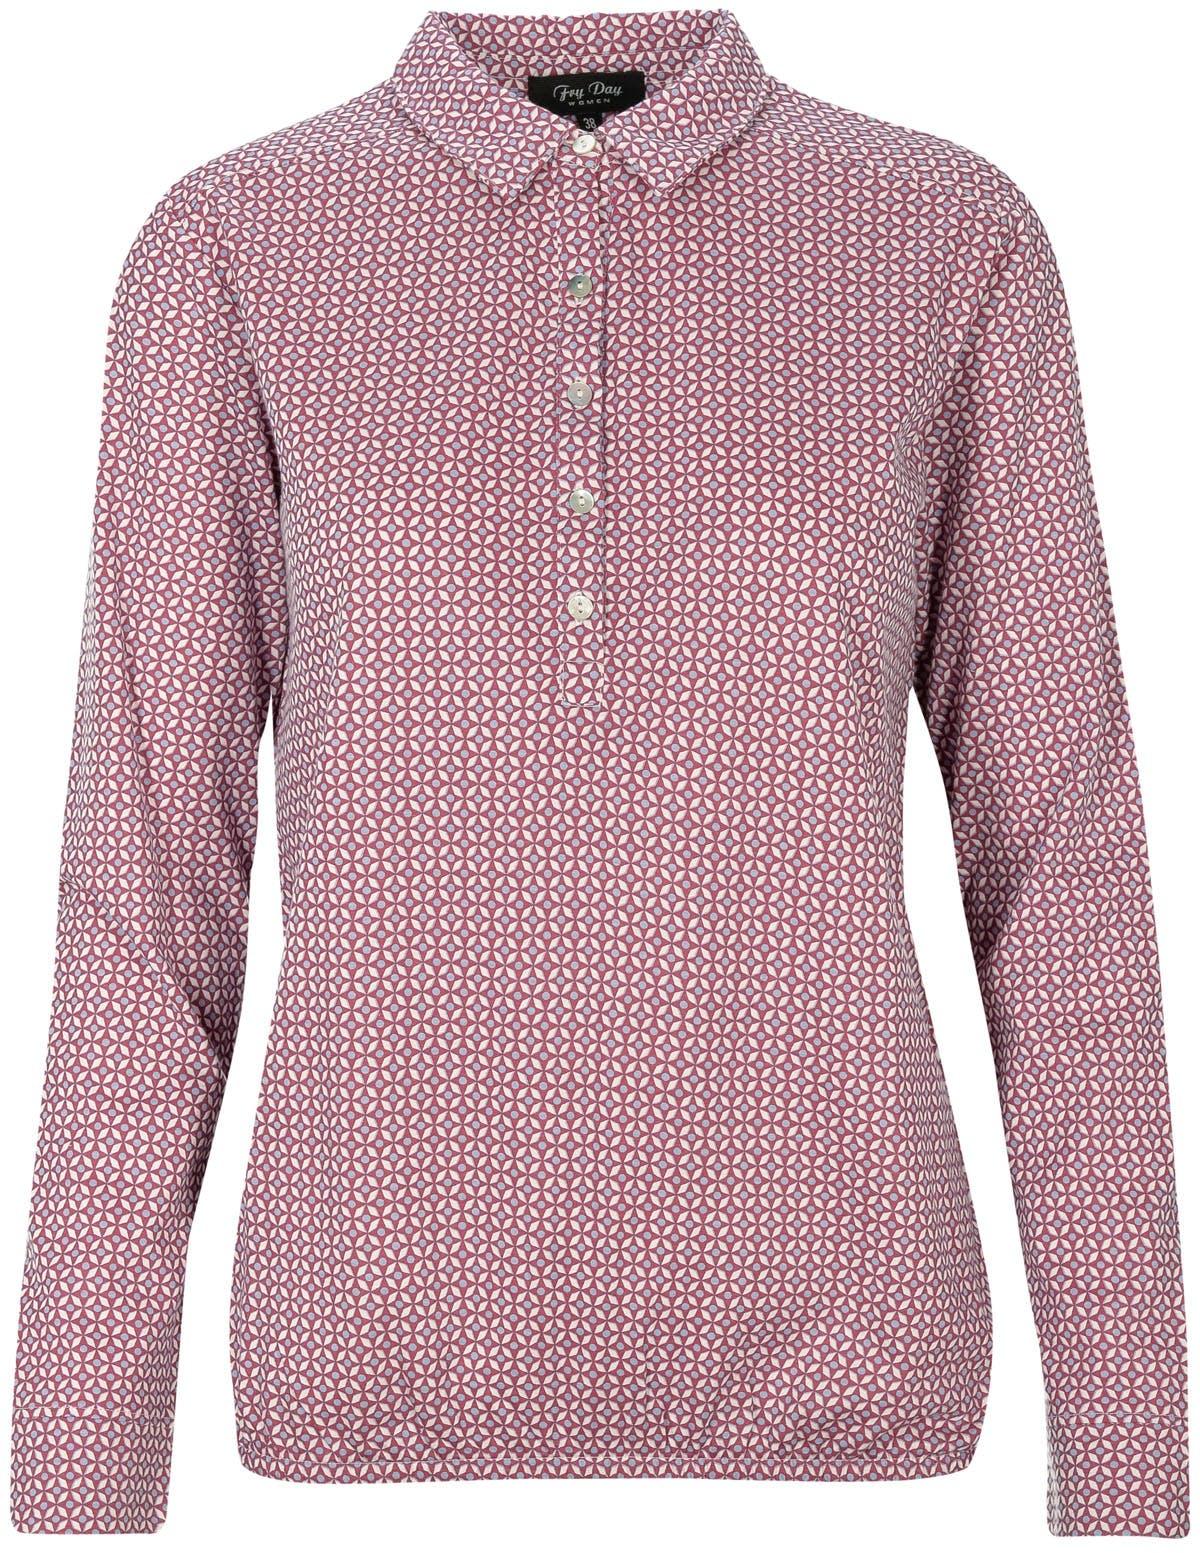 FRY DAY Shirt mit Alloverdruck - Light Rose